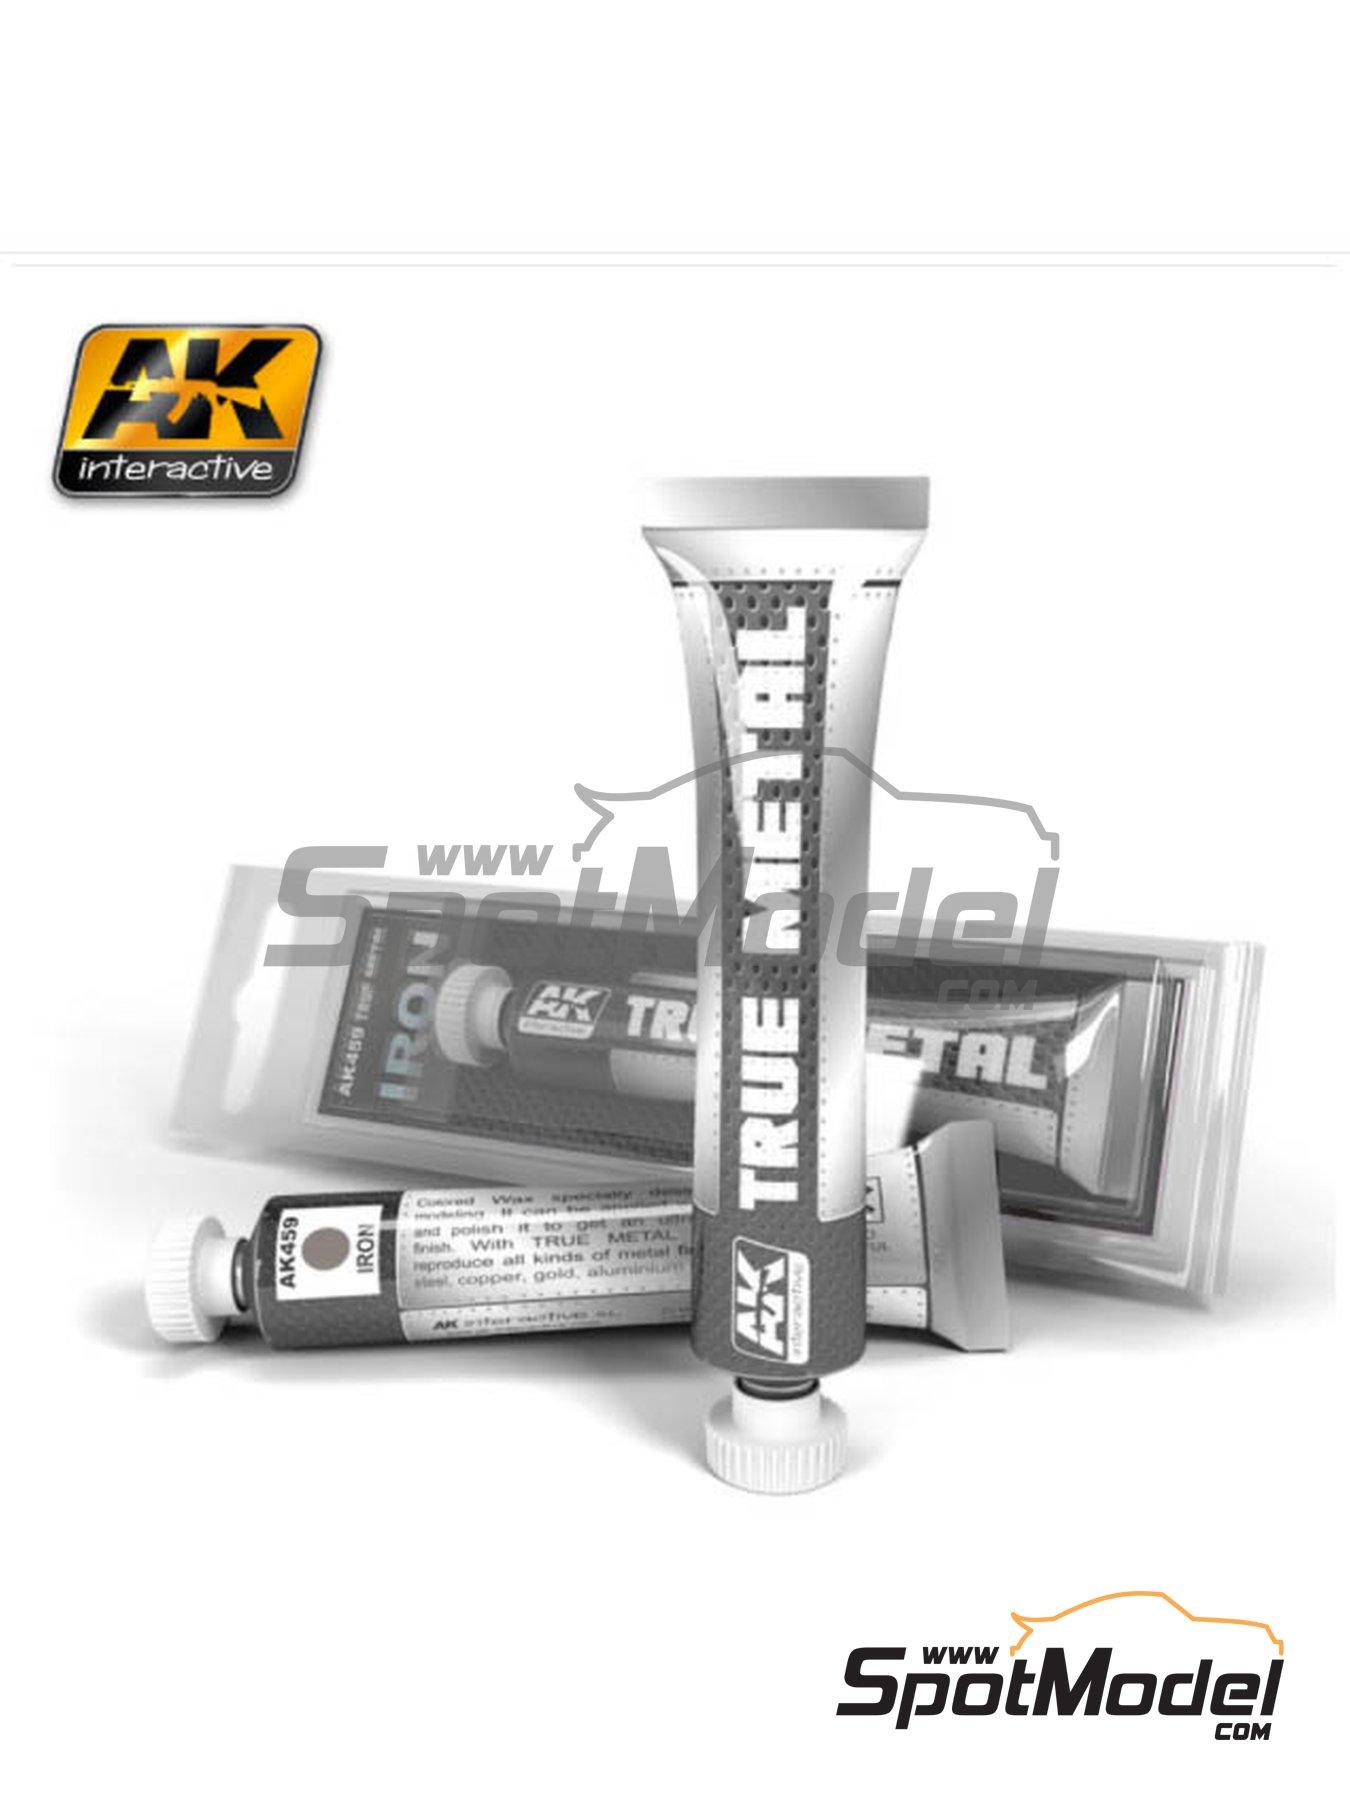 Iron | AK True Metal product manufactured by AK Interactive (ref.AK-459) image